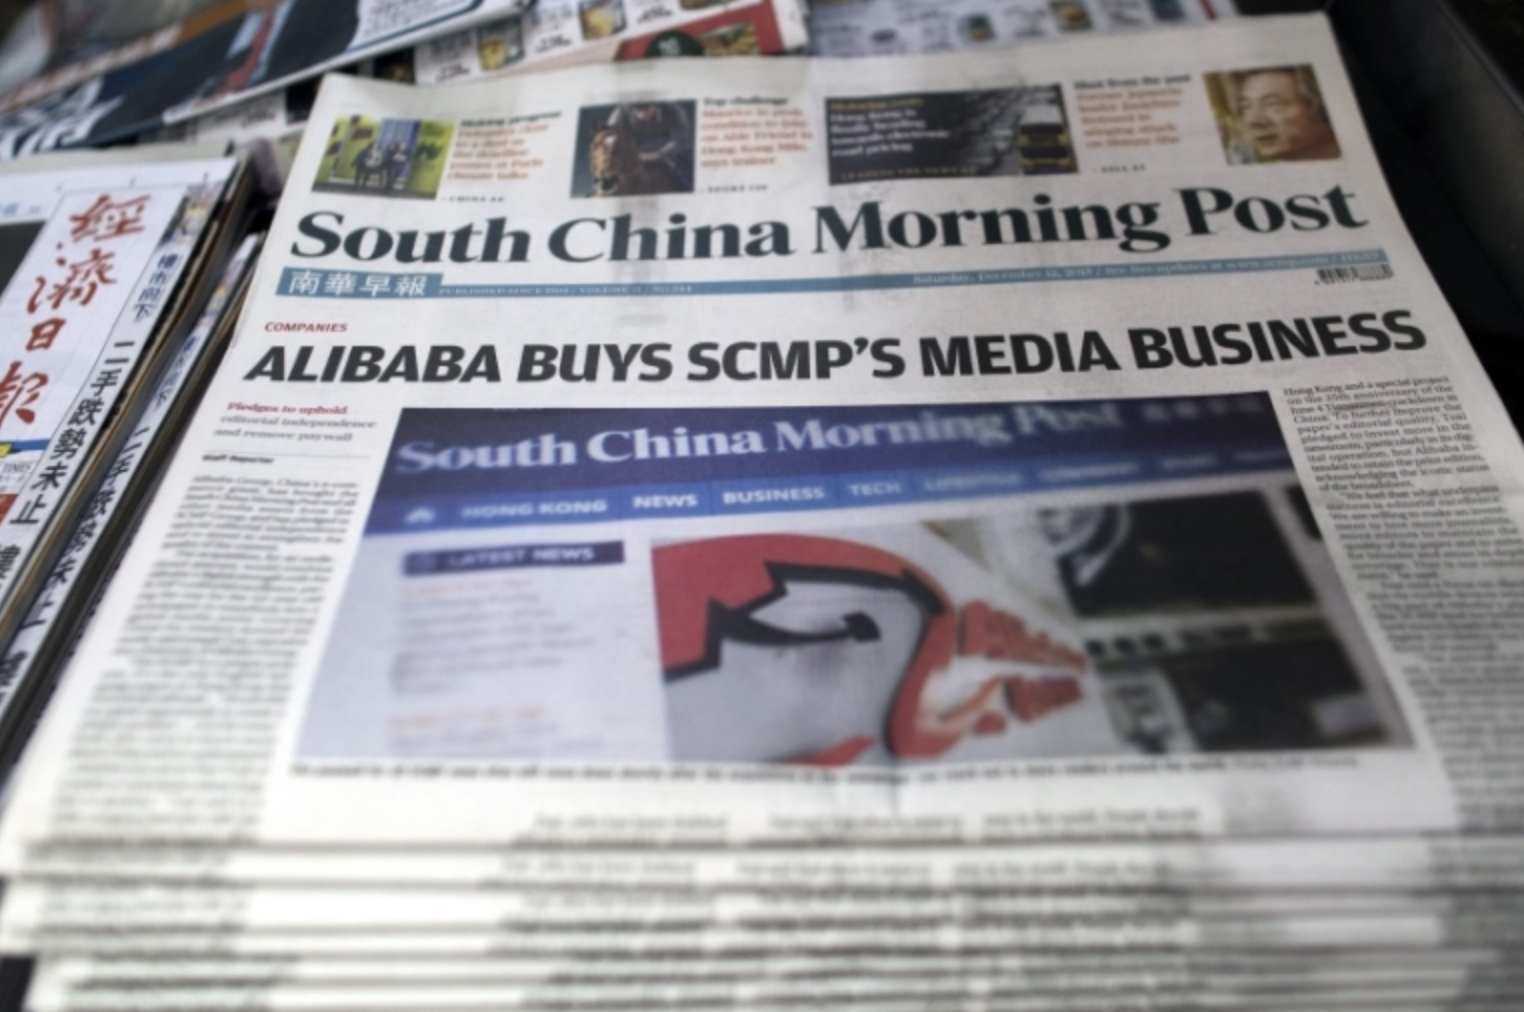 Alibaba asset South china Morning POst. Credit: aljazeera